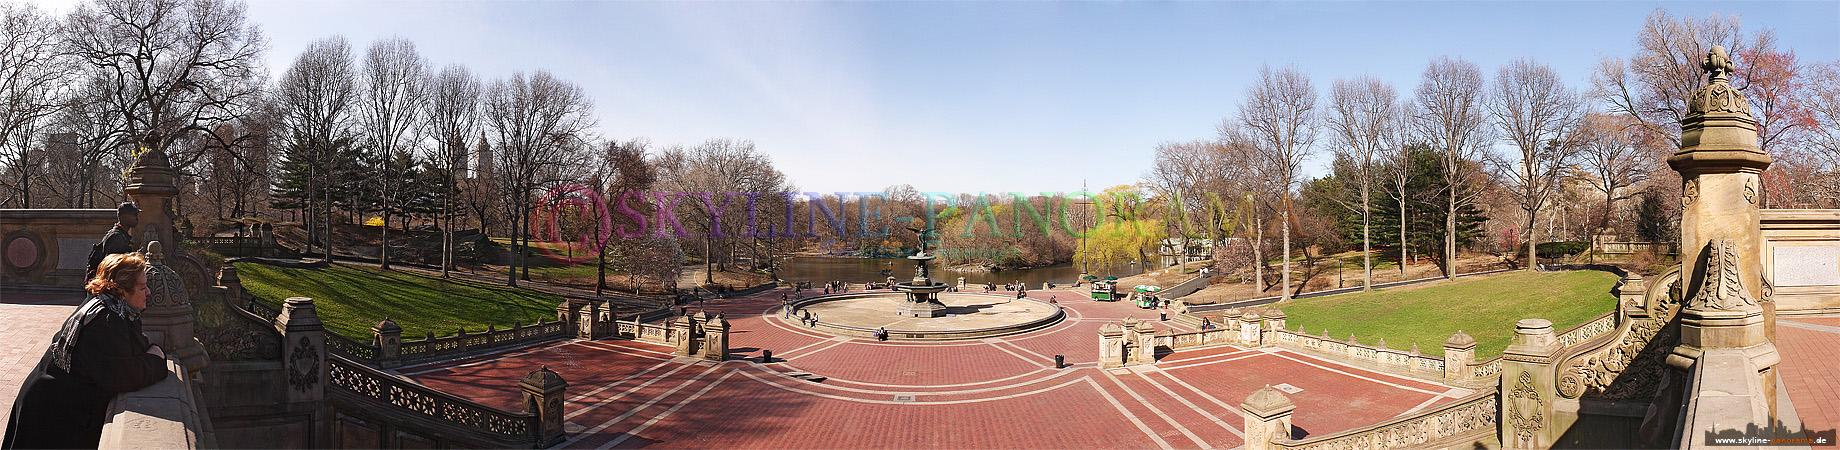 Bethesda Terrace im Central Park